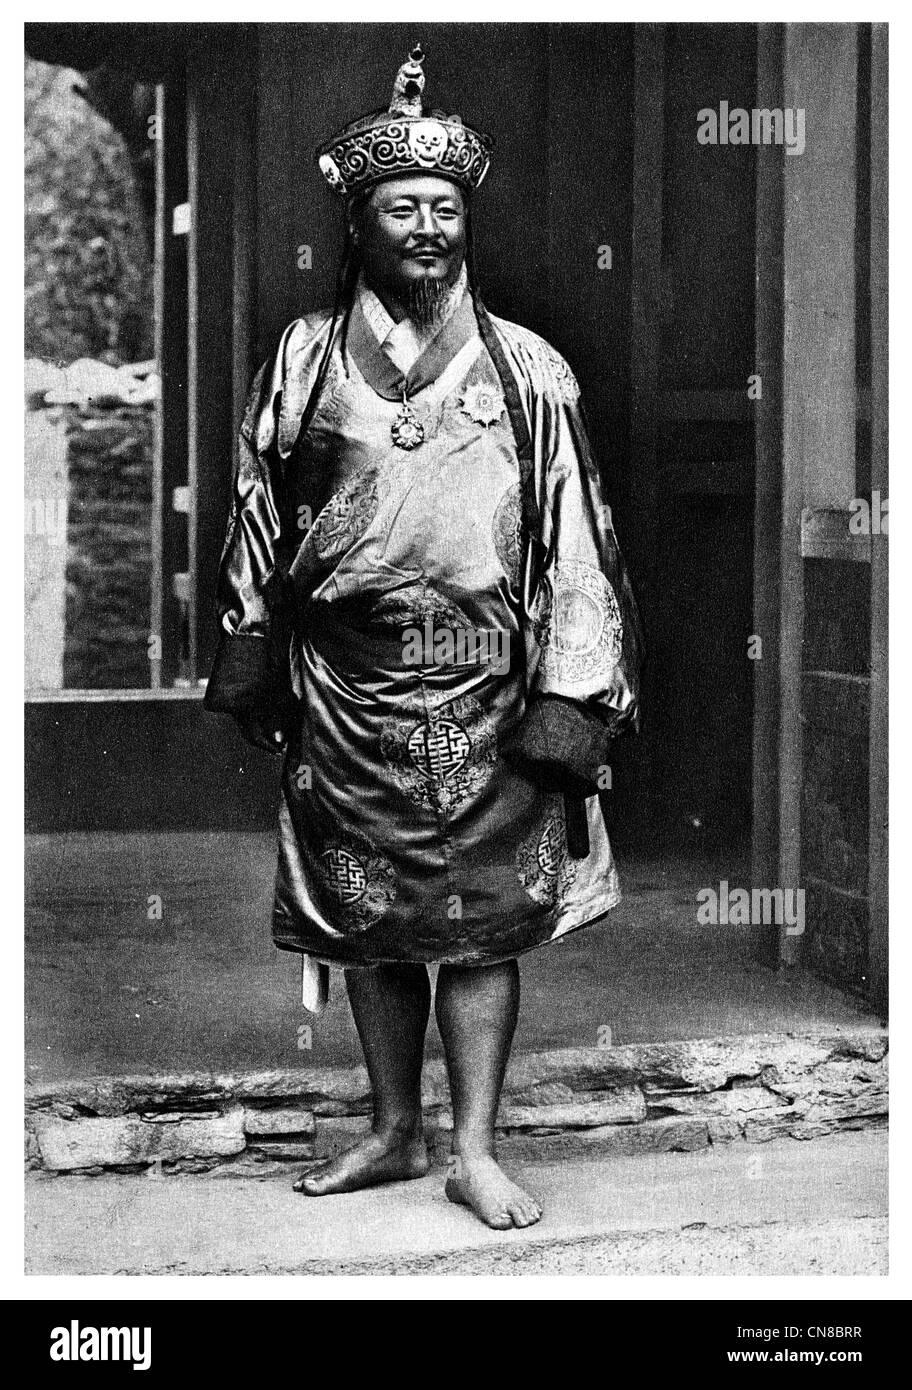 First published 1914 King of Bhutan Sir Gongsa Ugyen Wangchuck 1862–1926 first King of Bhutan - Stock Image